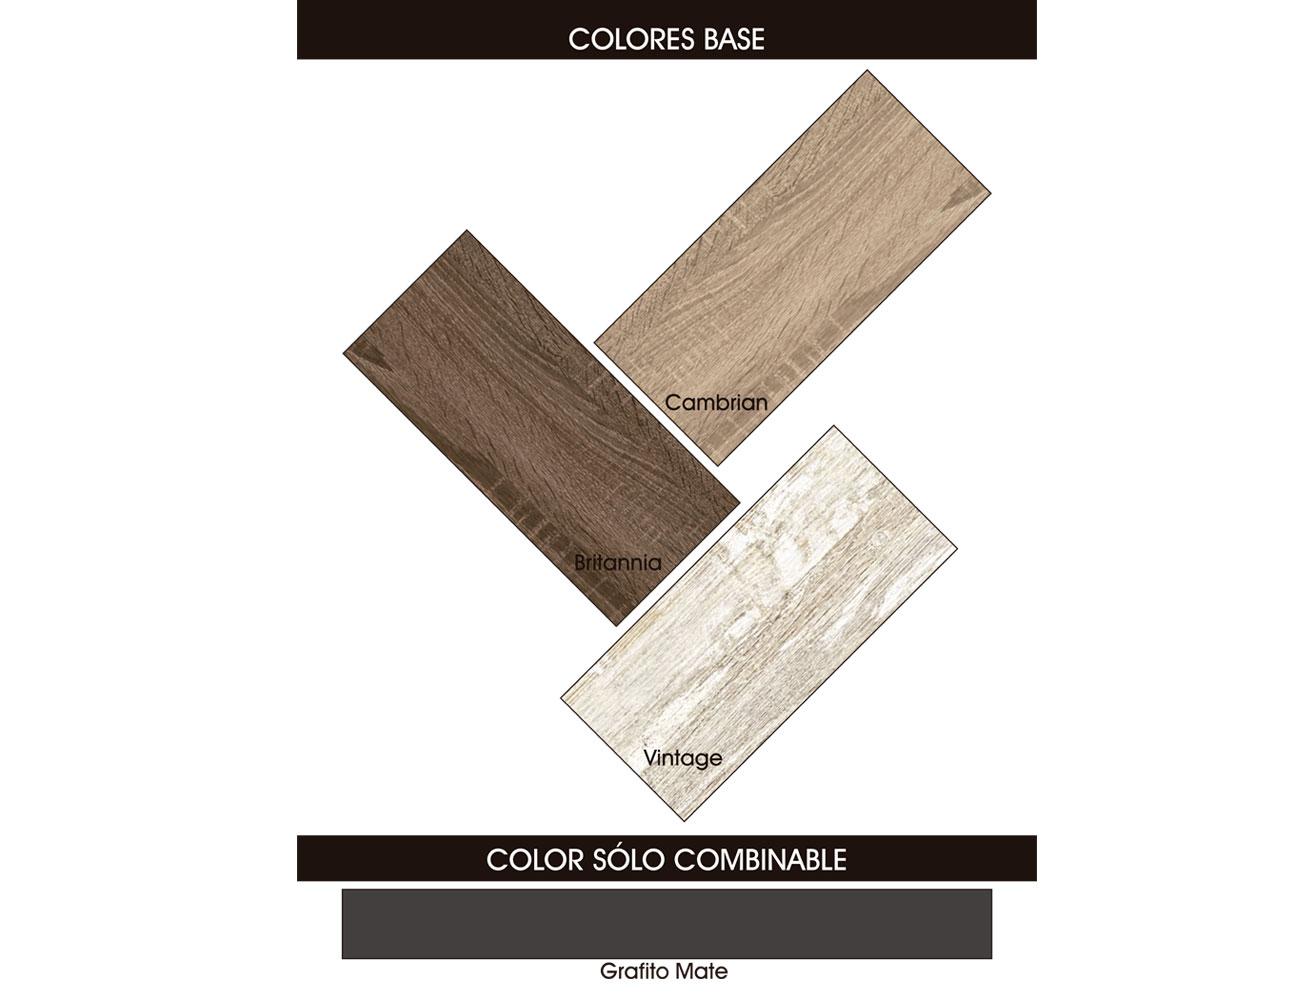 Colores 234